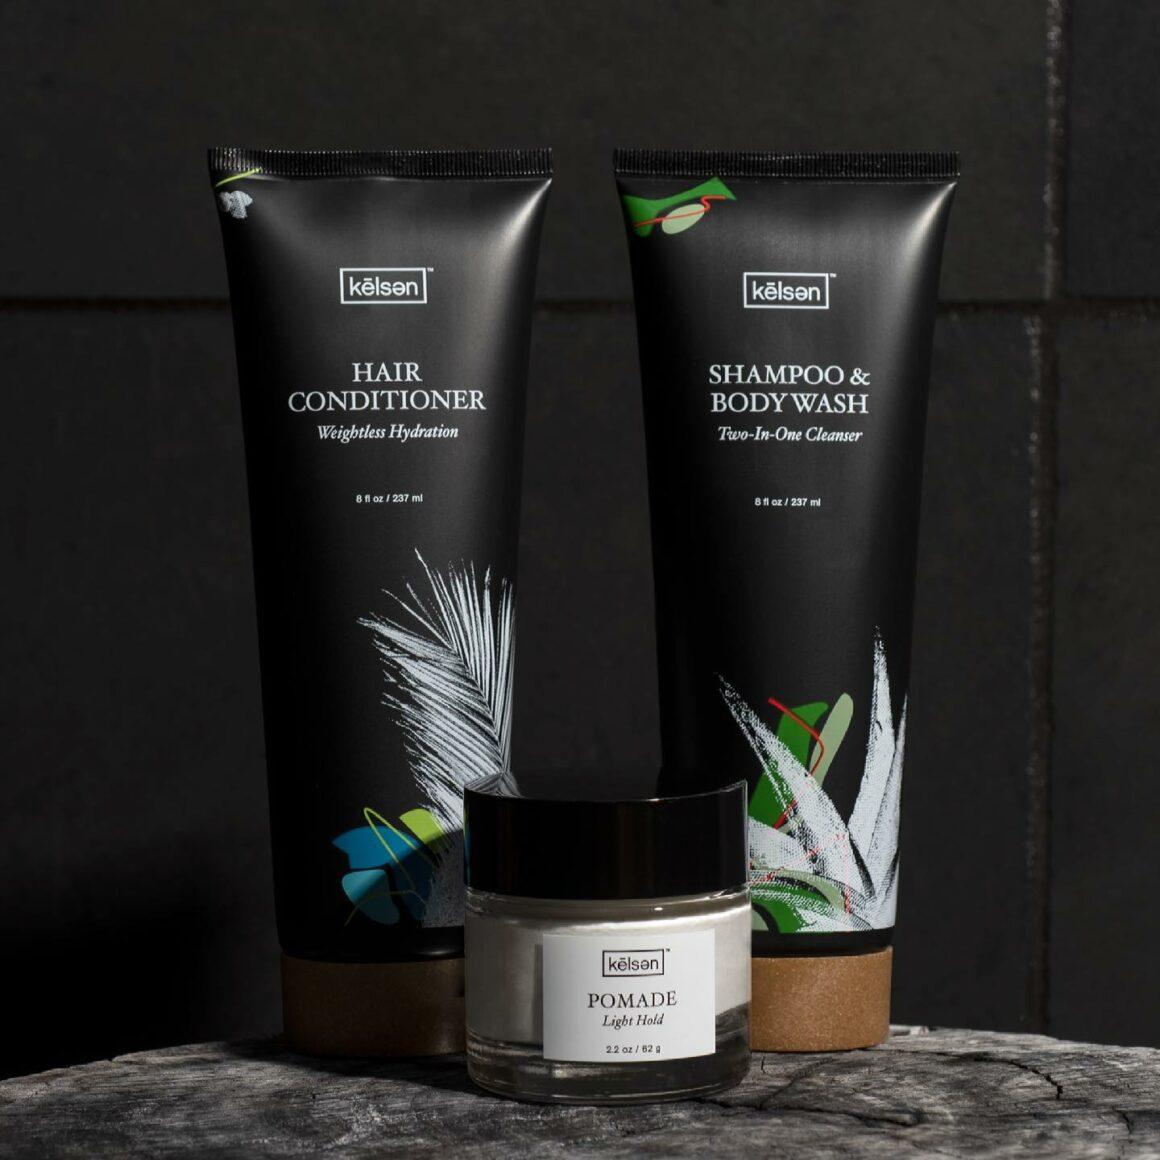 Natural and Organic Skincare Brands for Men - Kelsen